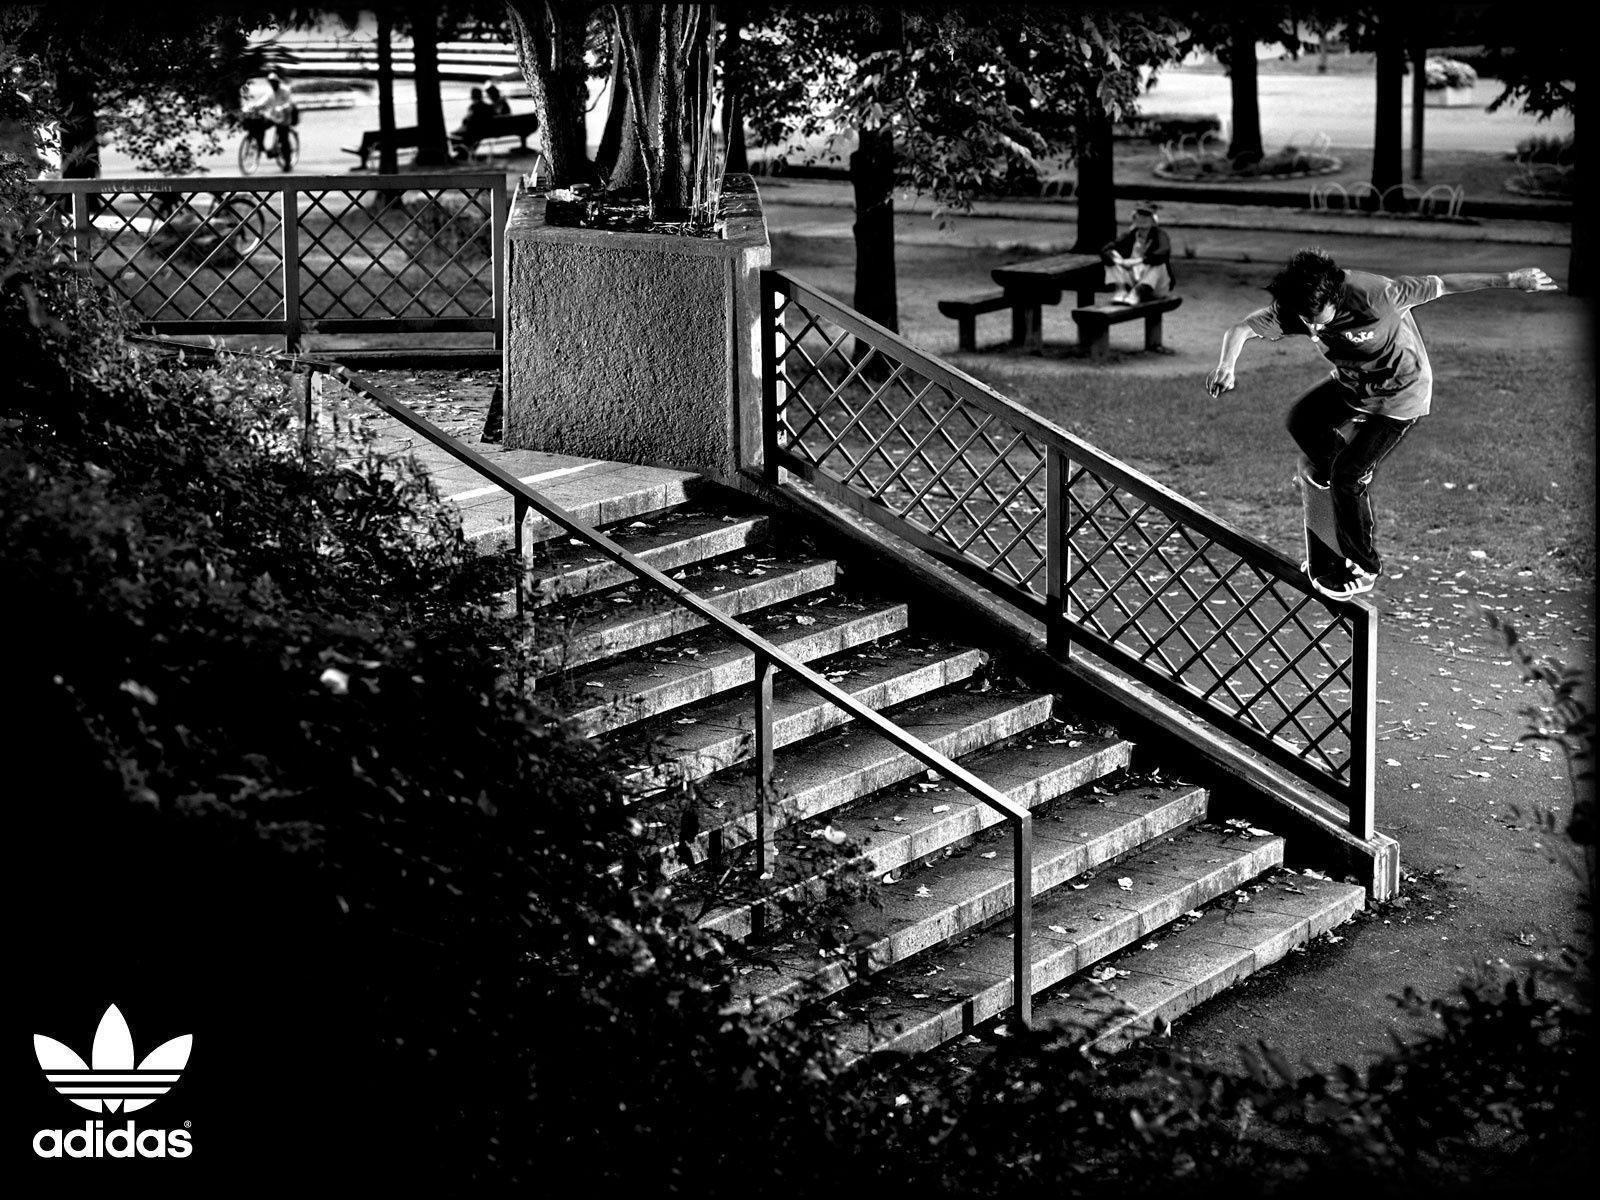 Adidas Skateboarding Wallpaper 8724 HD Desktop Backgrounds And